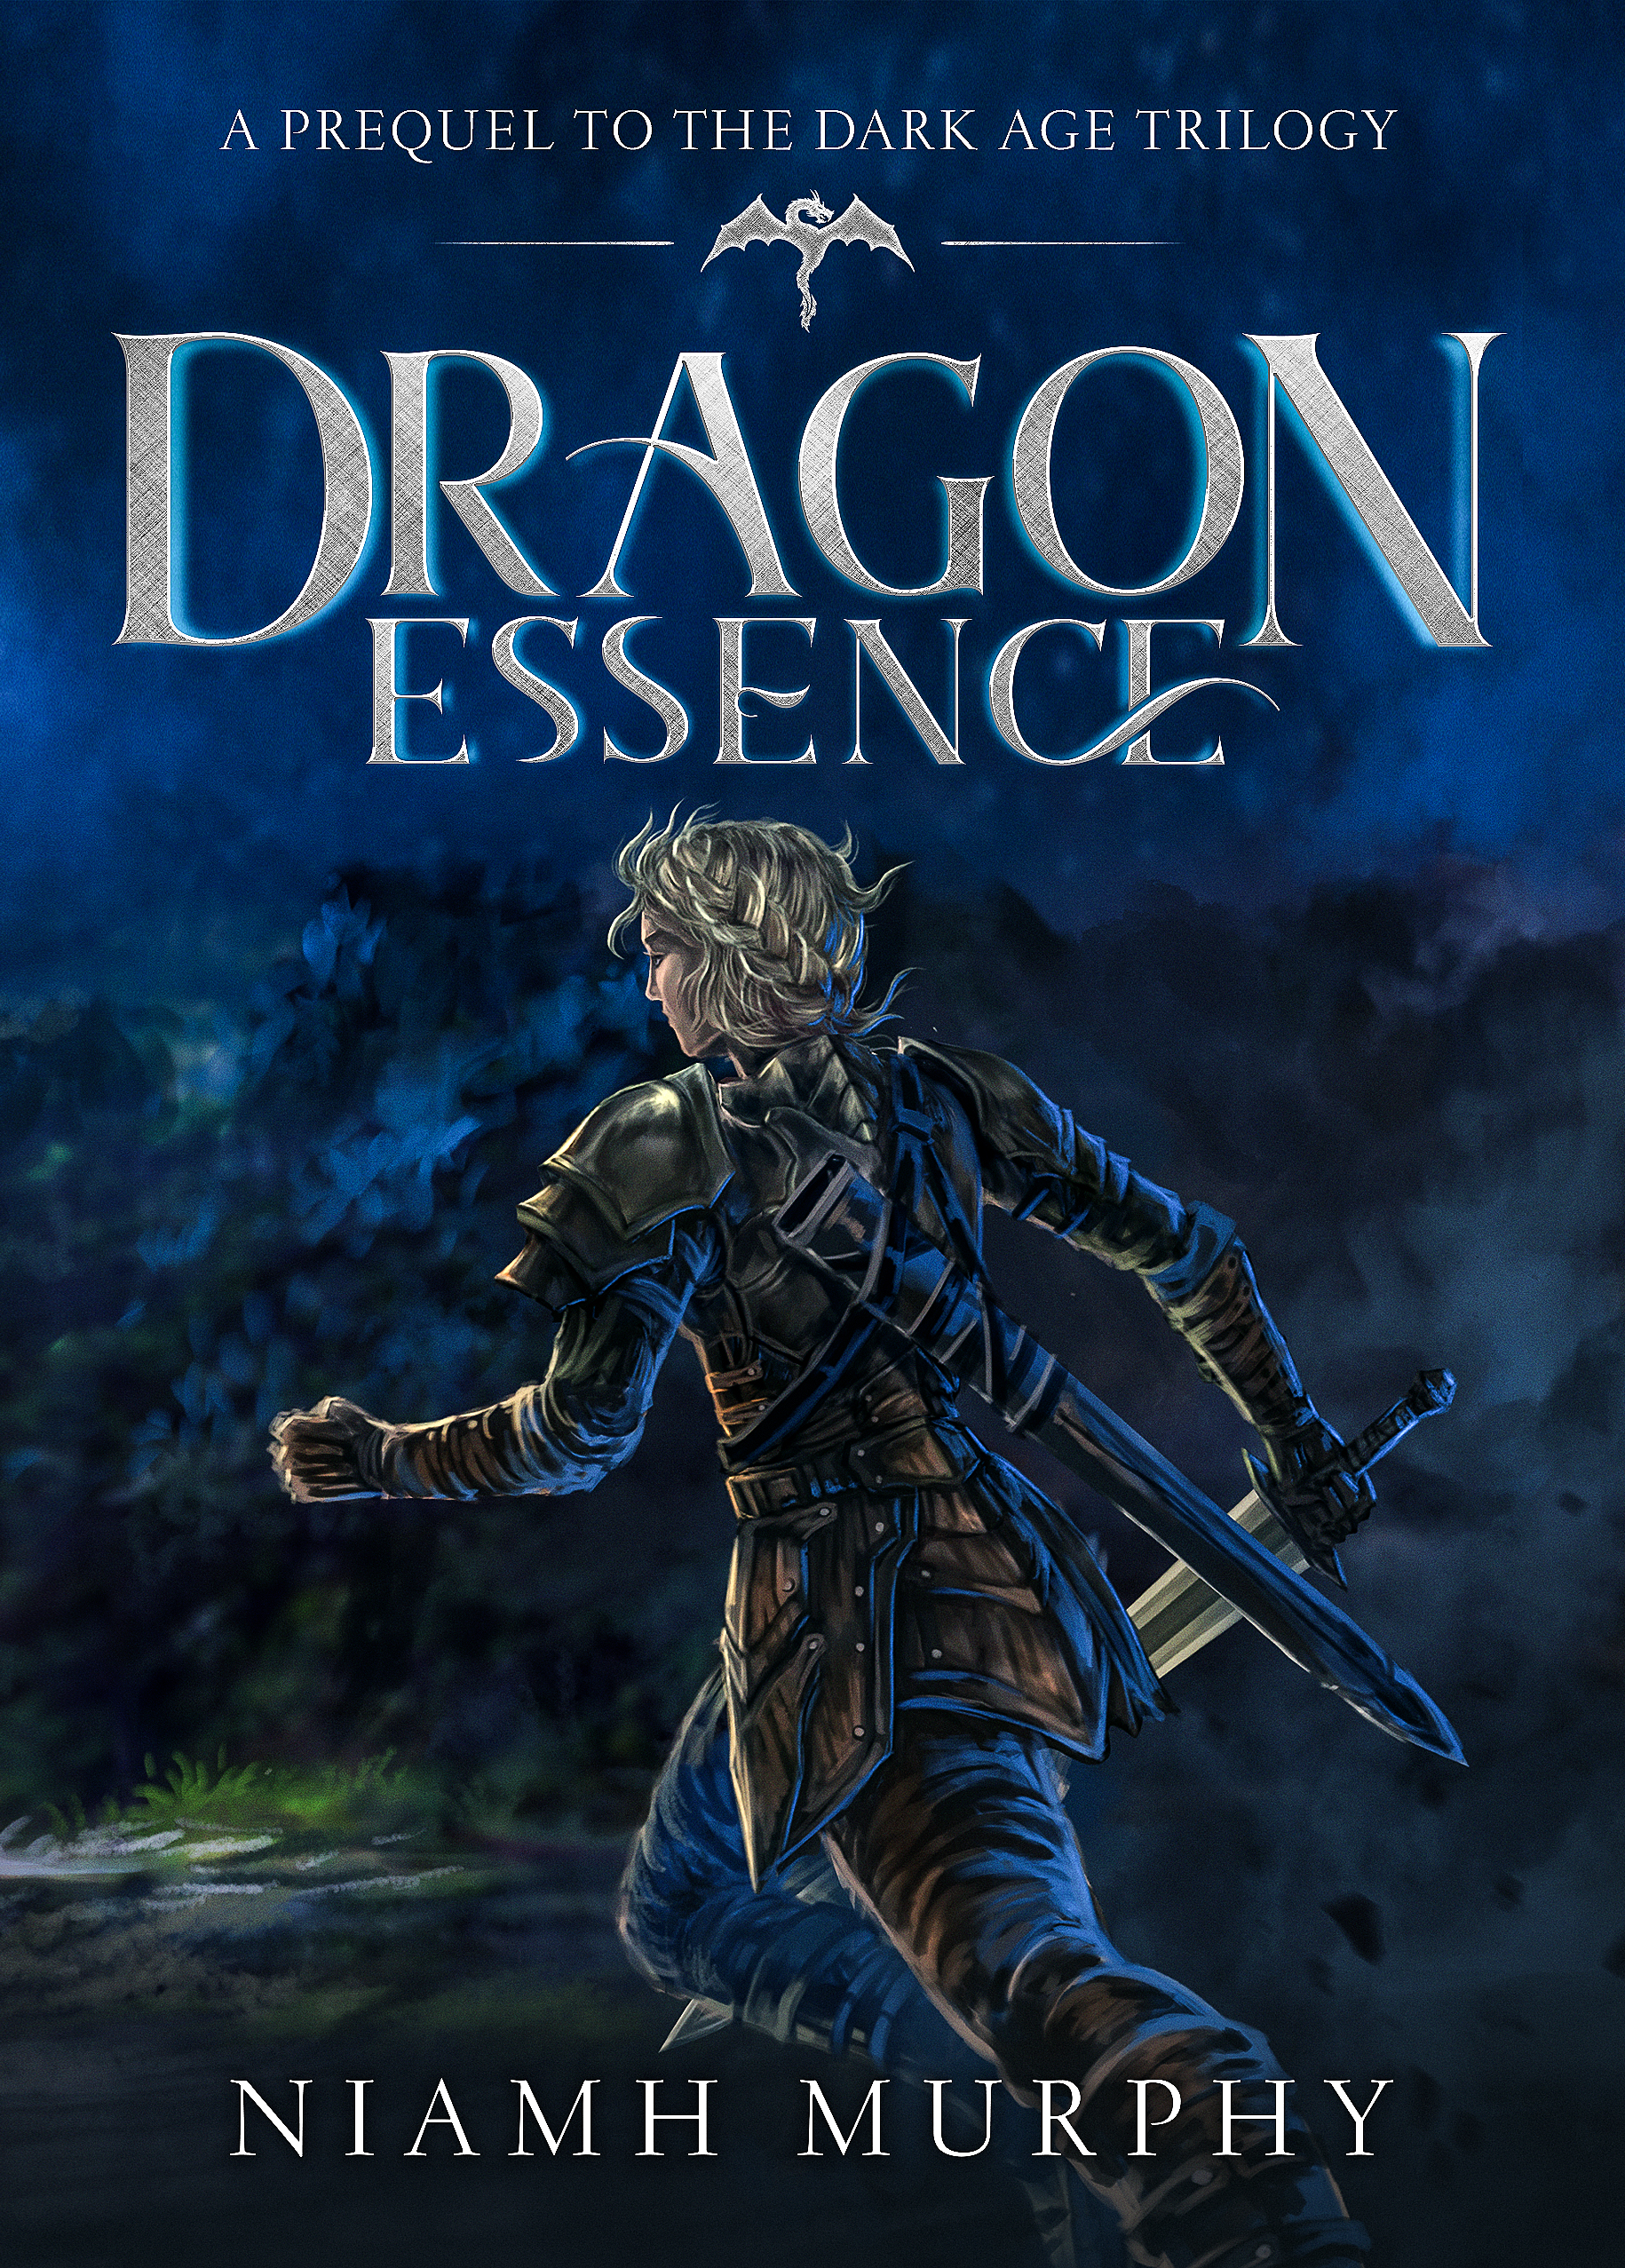 Niamh Murphy - Dragon Essence Cover